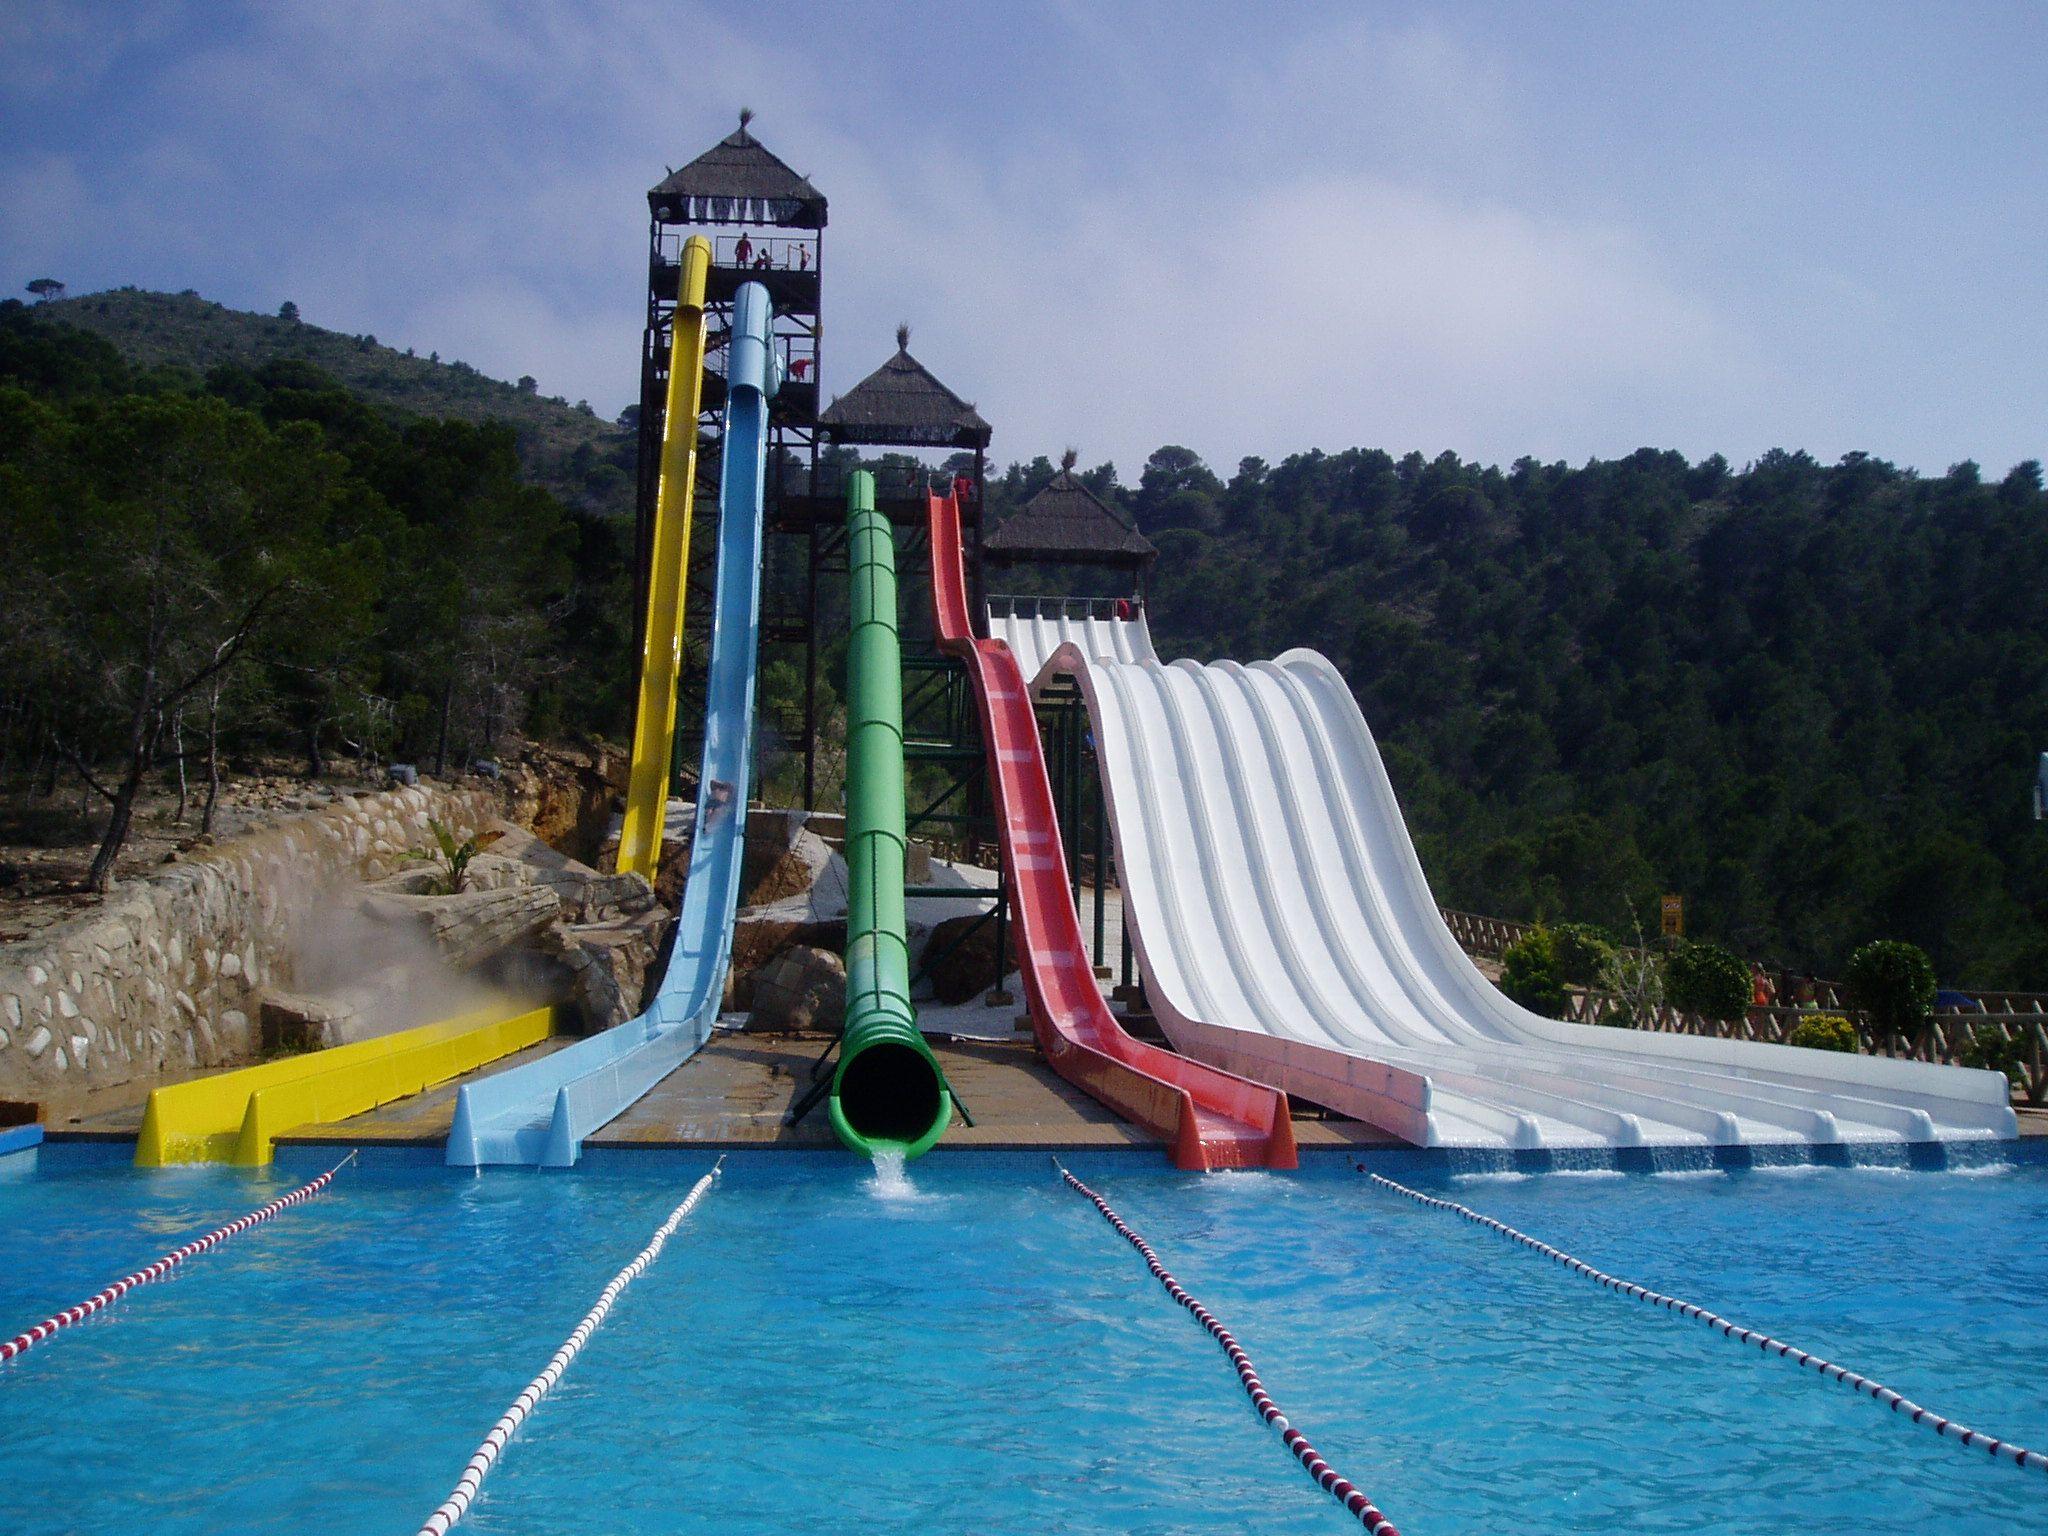 Aqualandia Water Park Benidorm Coata Blanca Spain